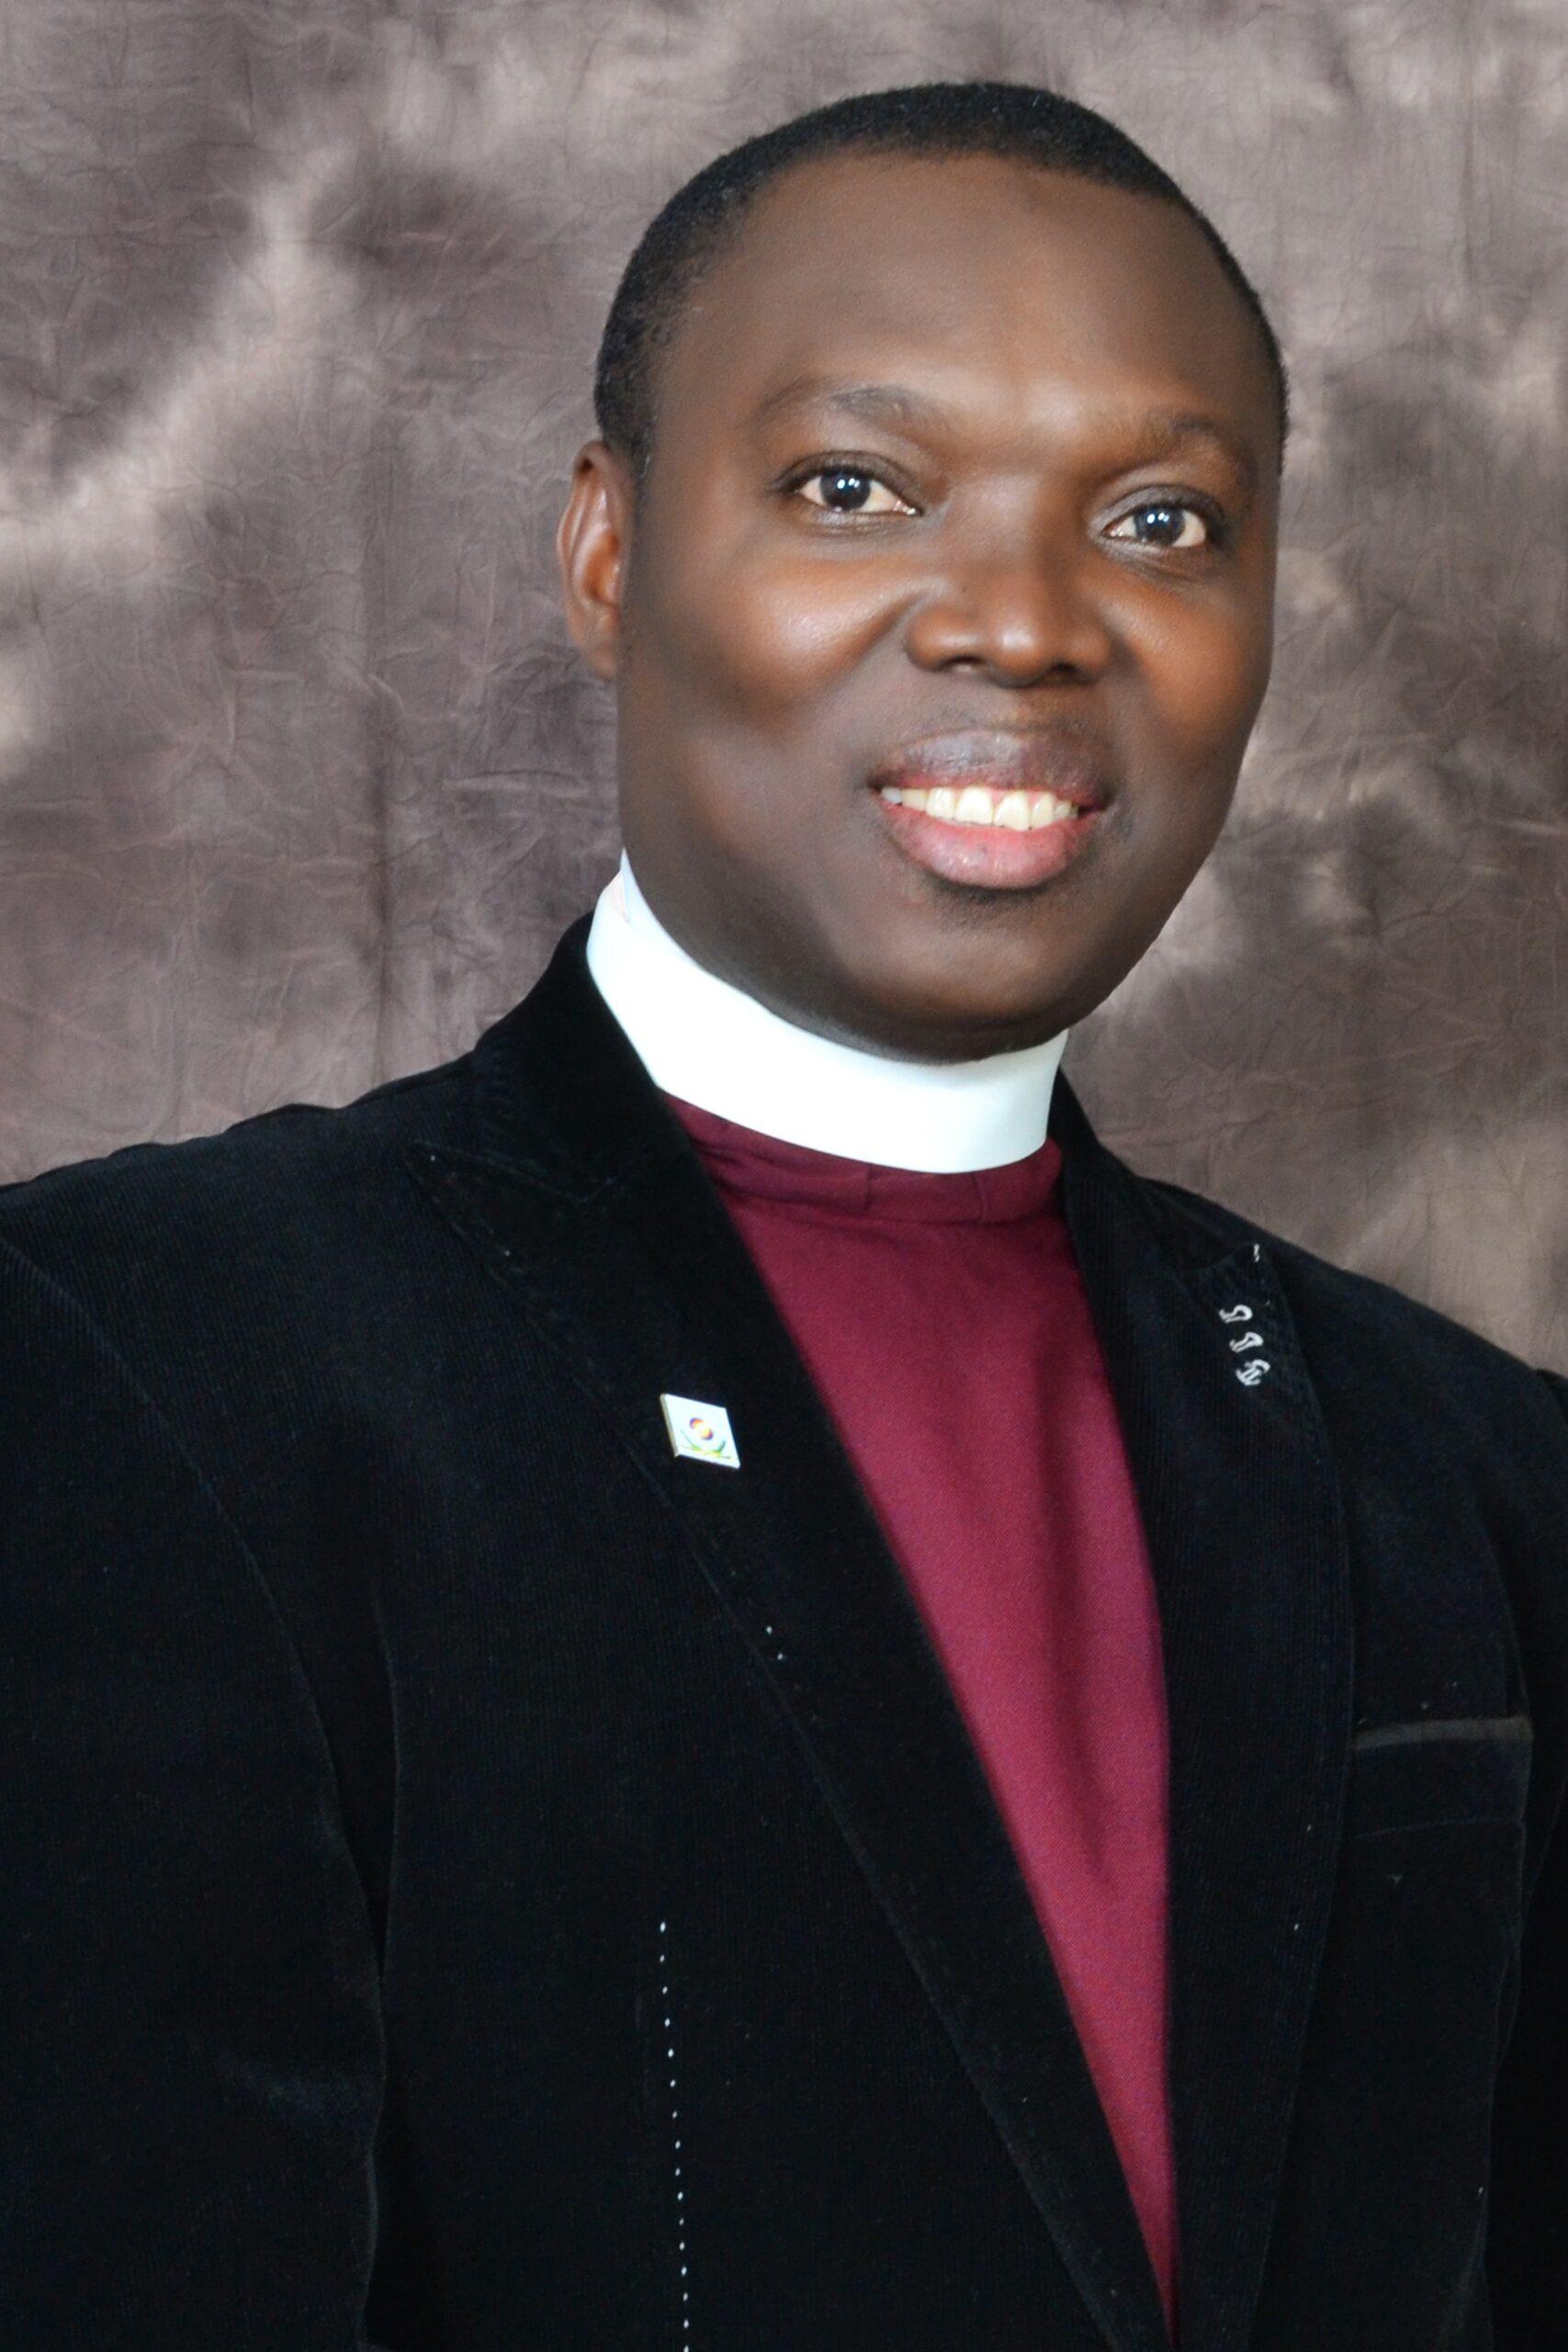 Return schools to missions, cleric urges govt